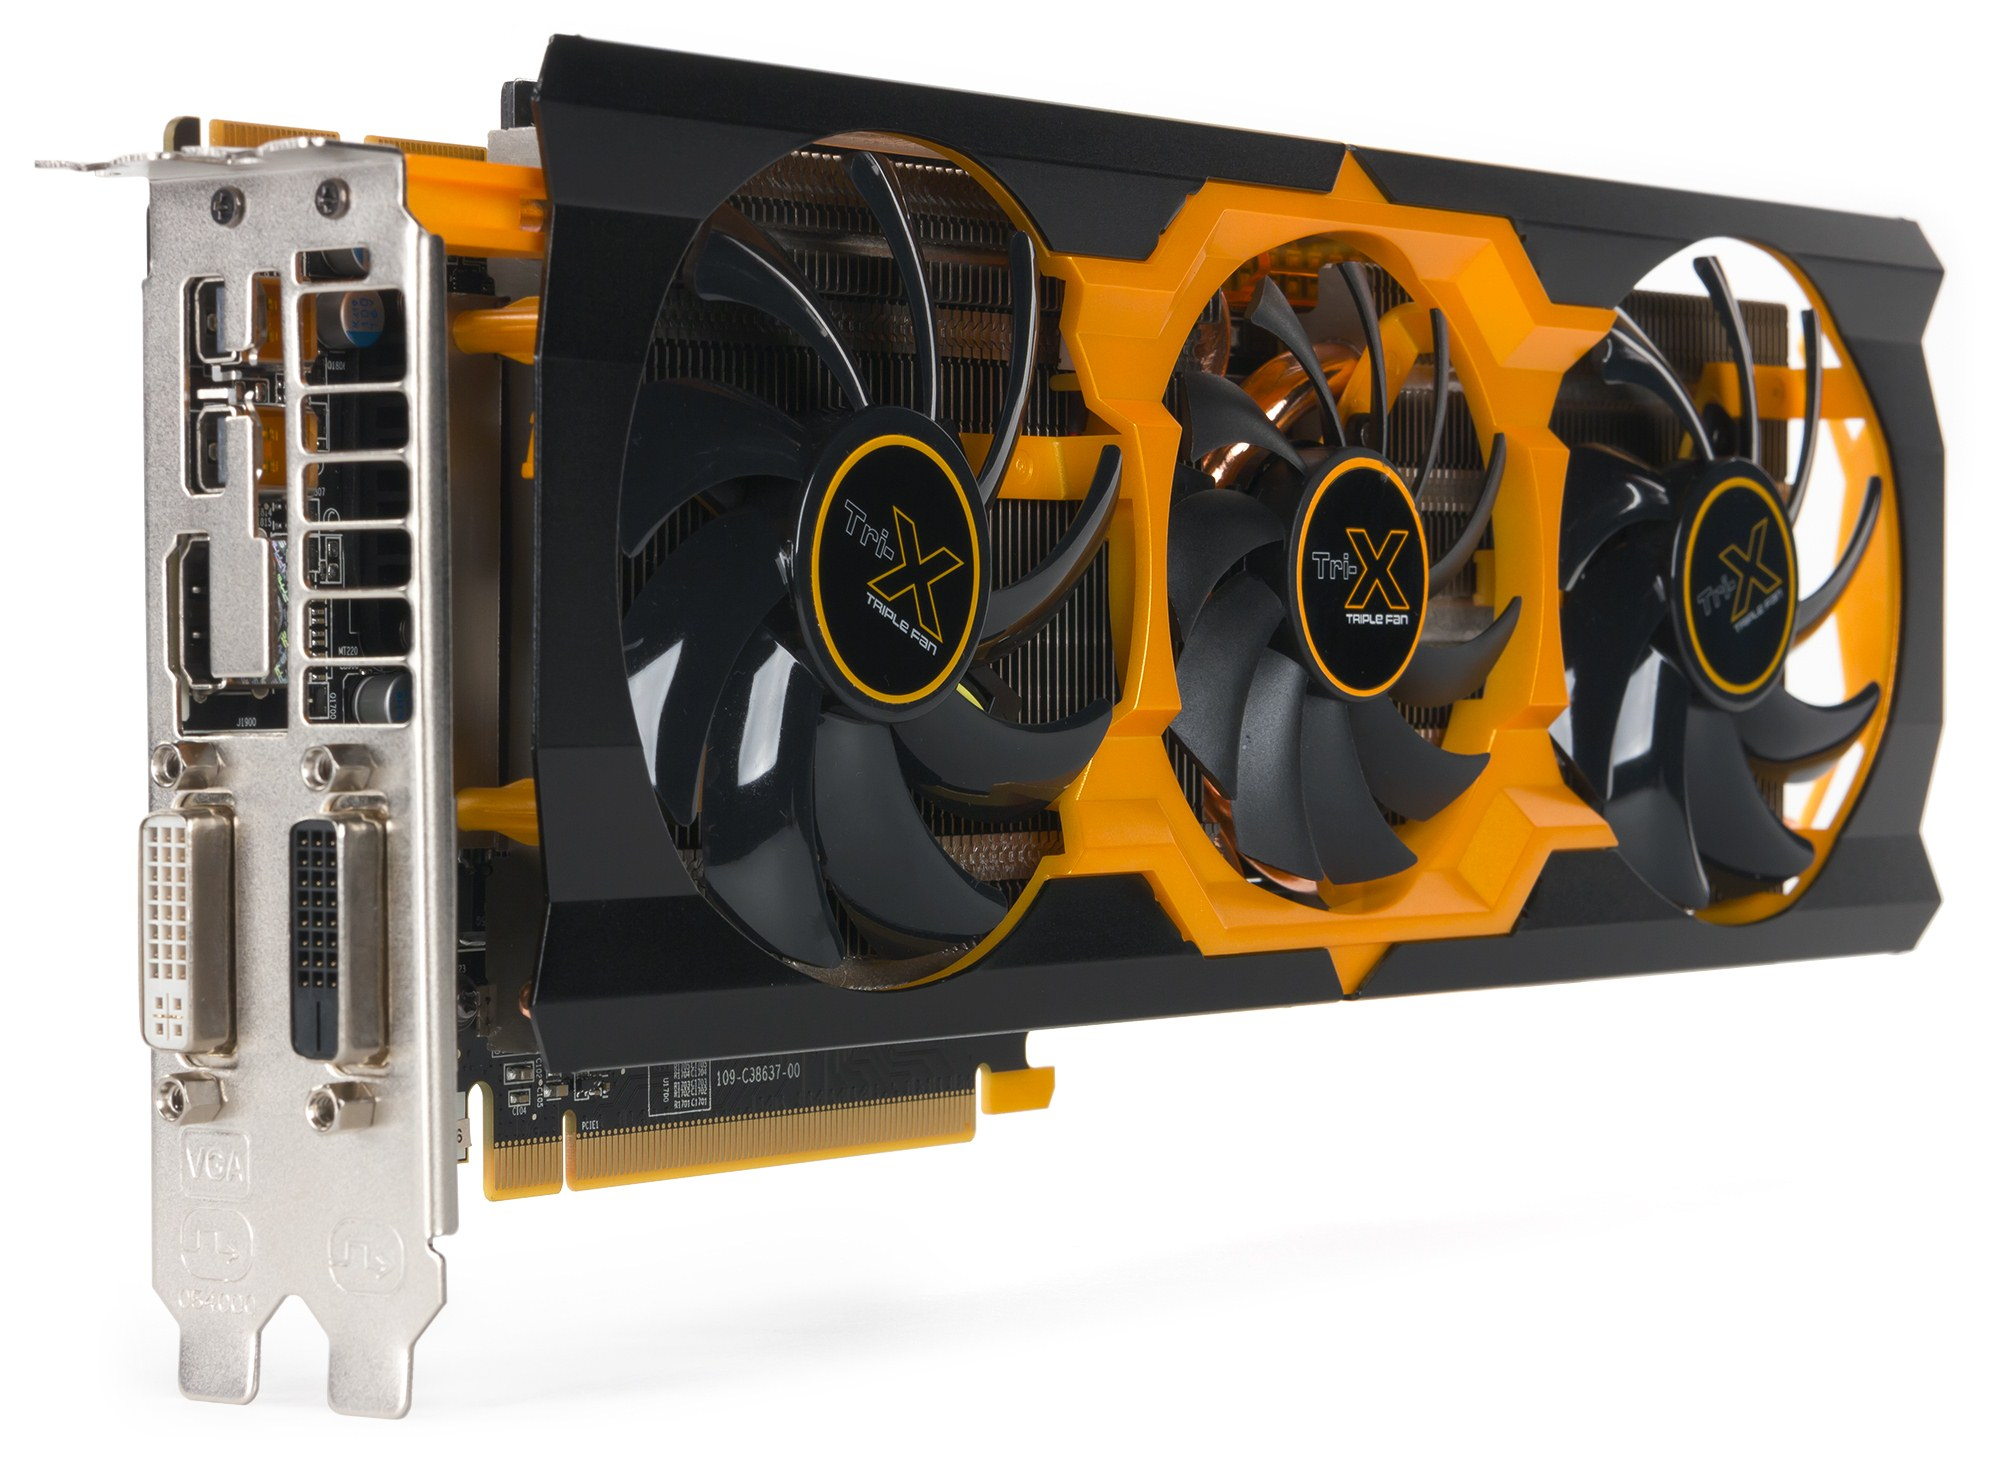 AMD Radeon R9 280X 3072 MB 384-битной DDR5 (1050/1050/6000